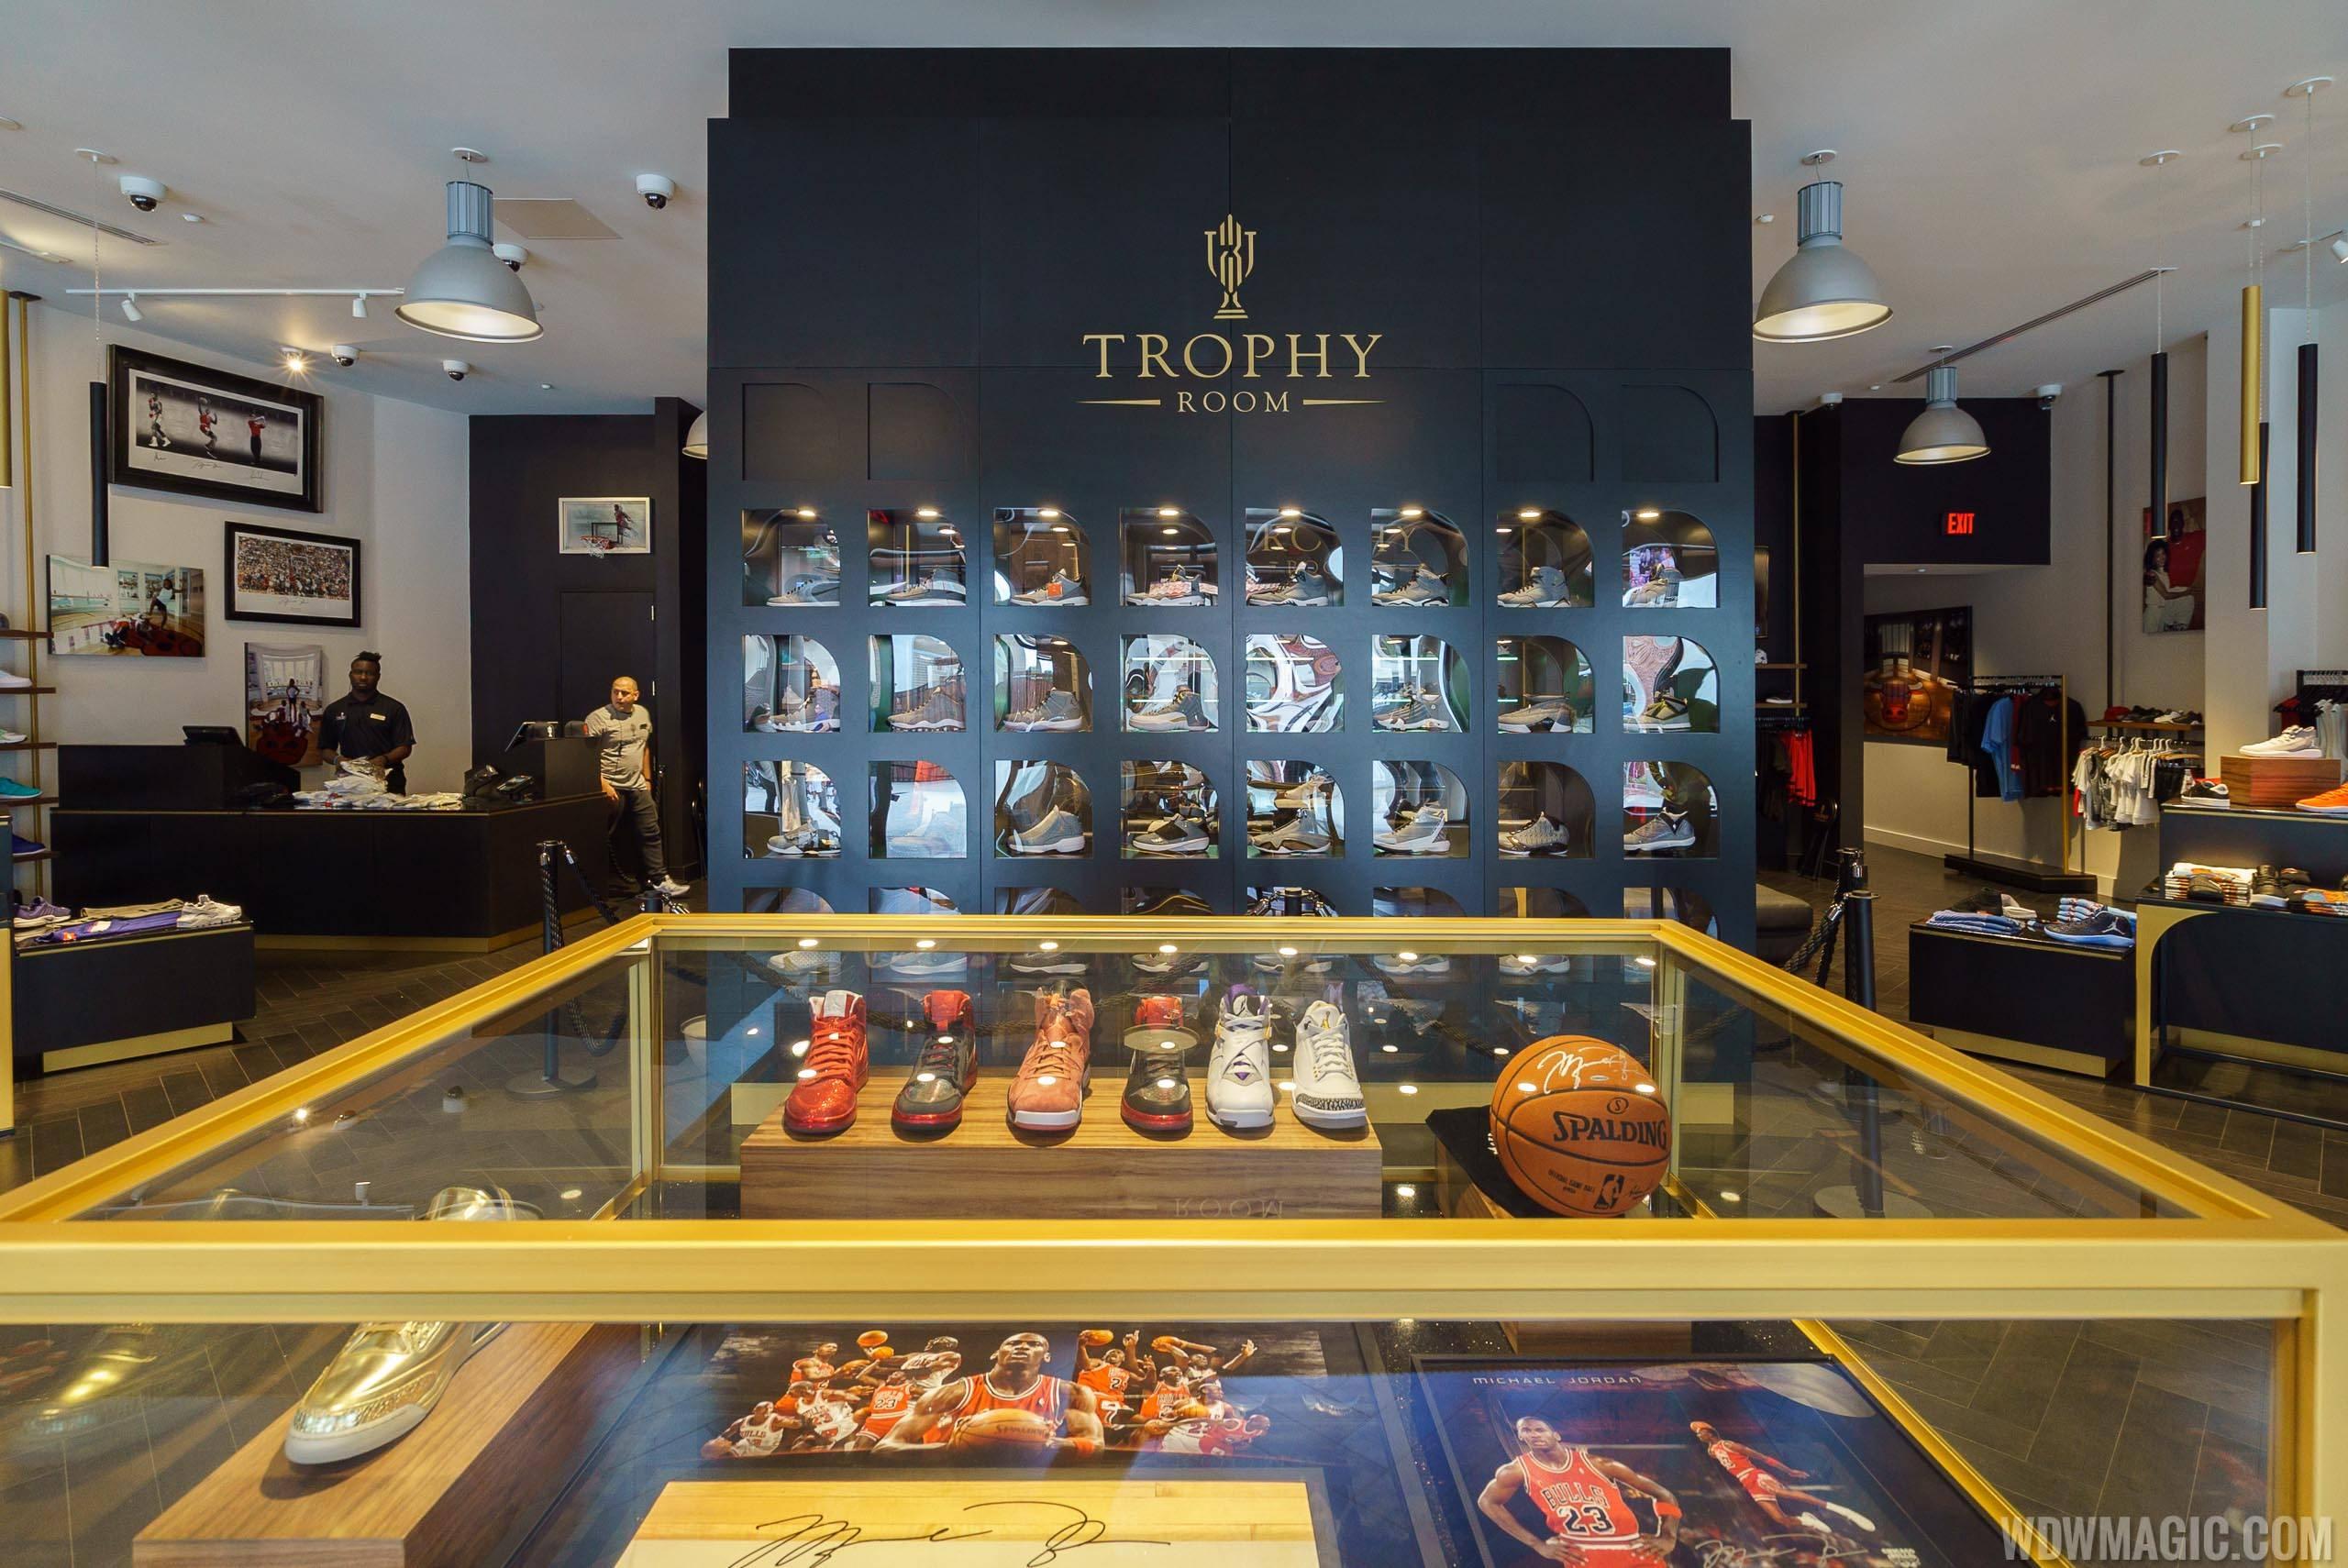 Trophy Room overview